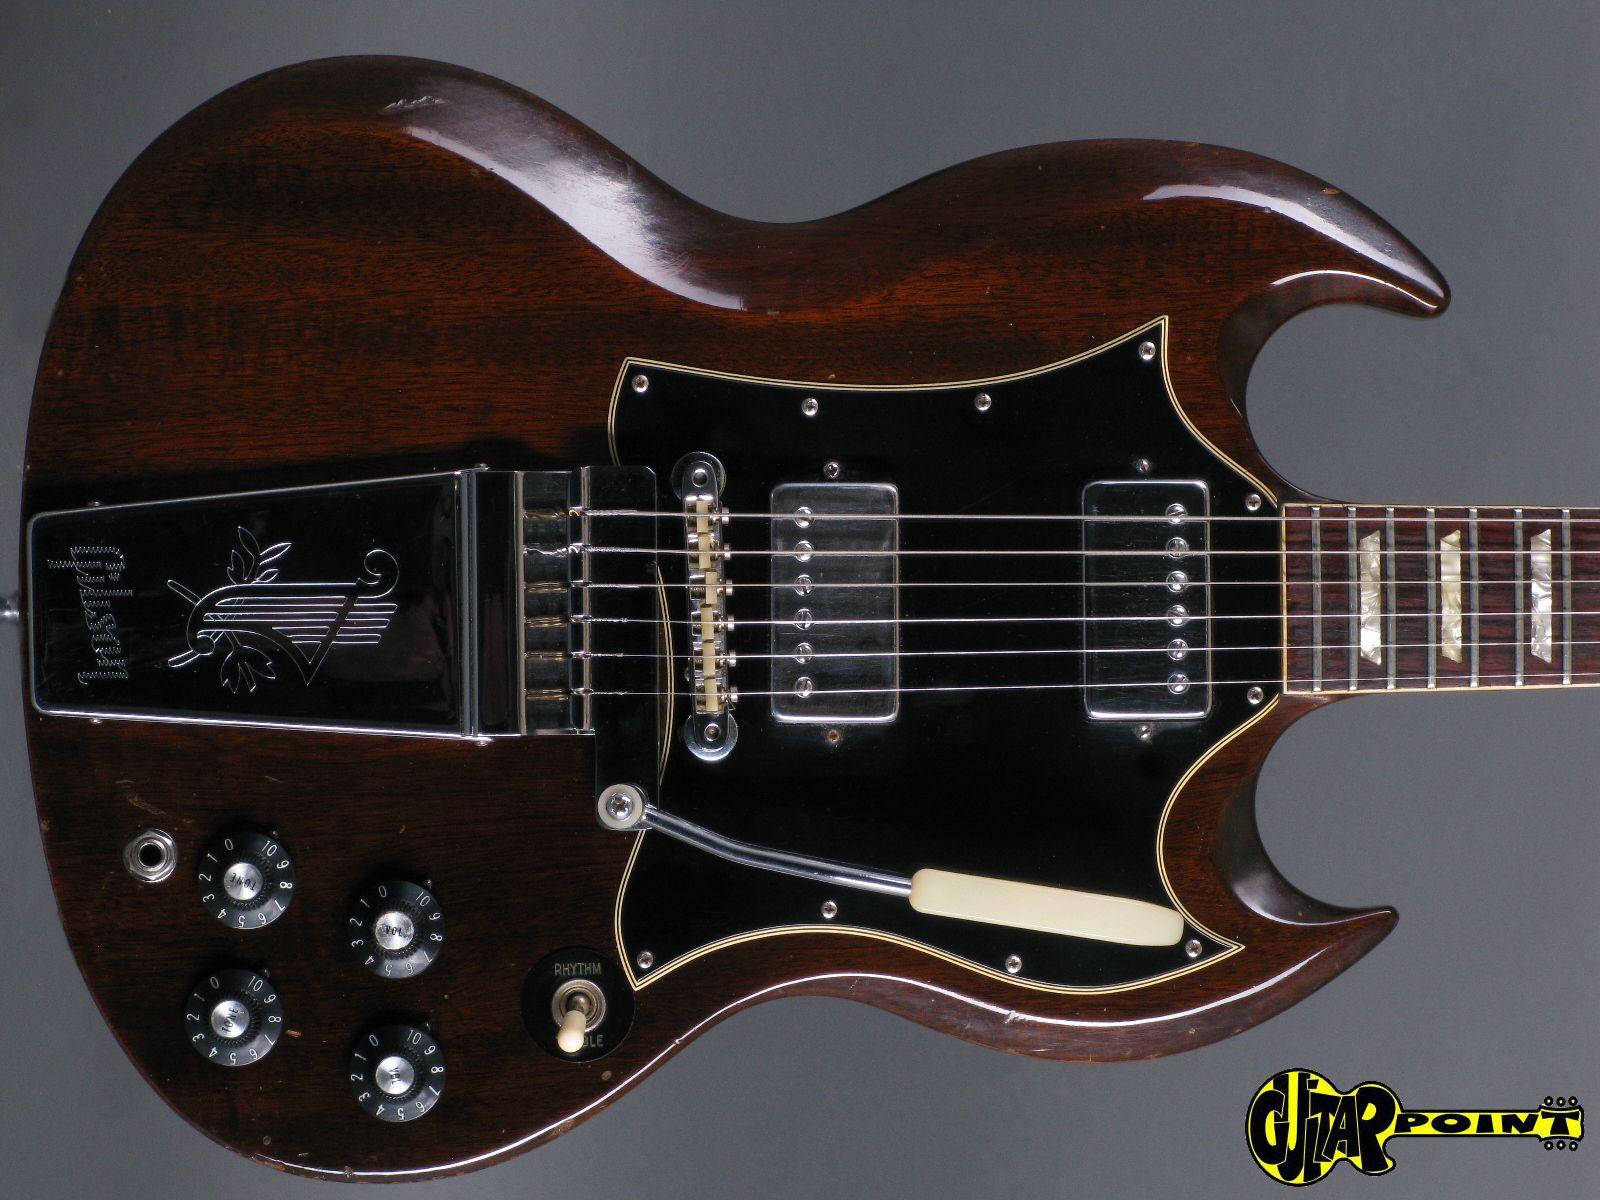 1969 gibson sg standard brown vi69gisgstd534477